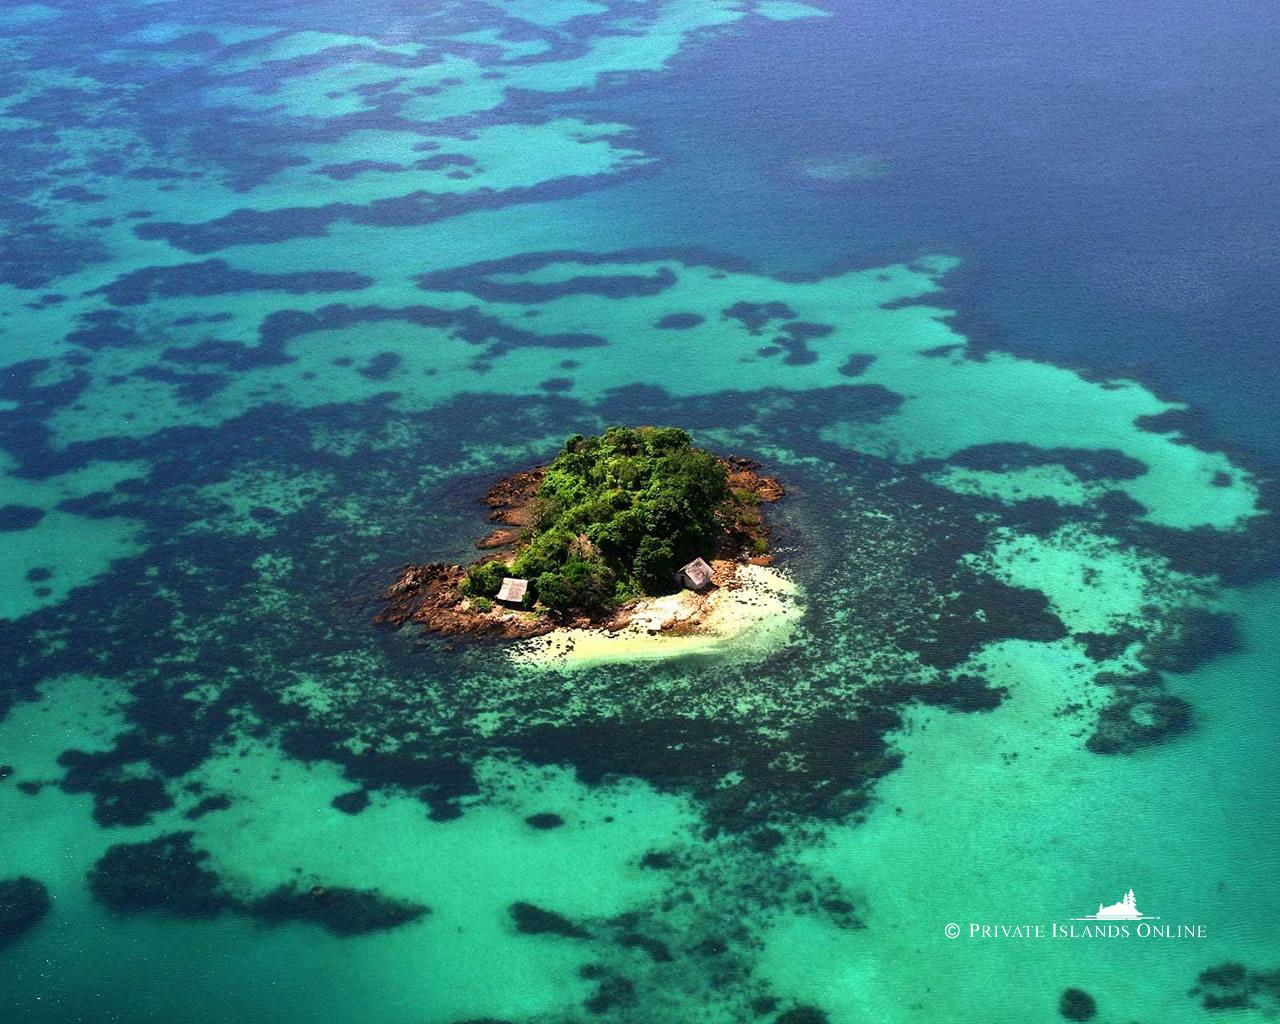 caribbean island wallpaperjpg 1280x1024